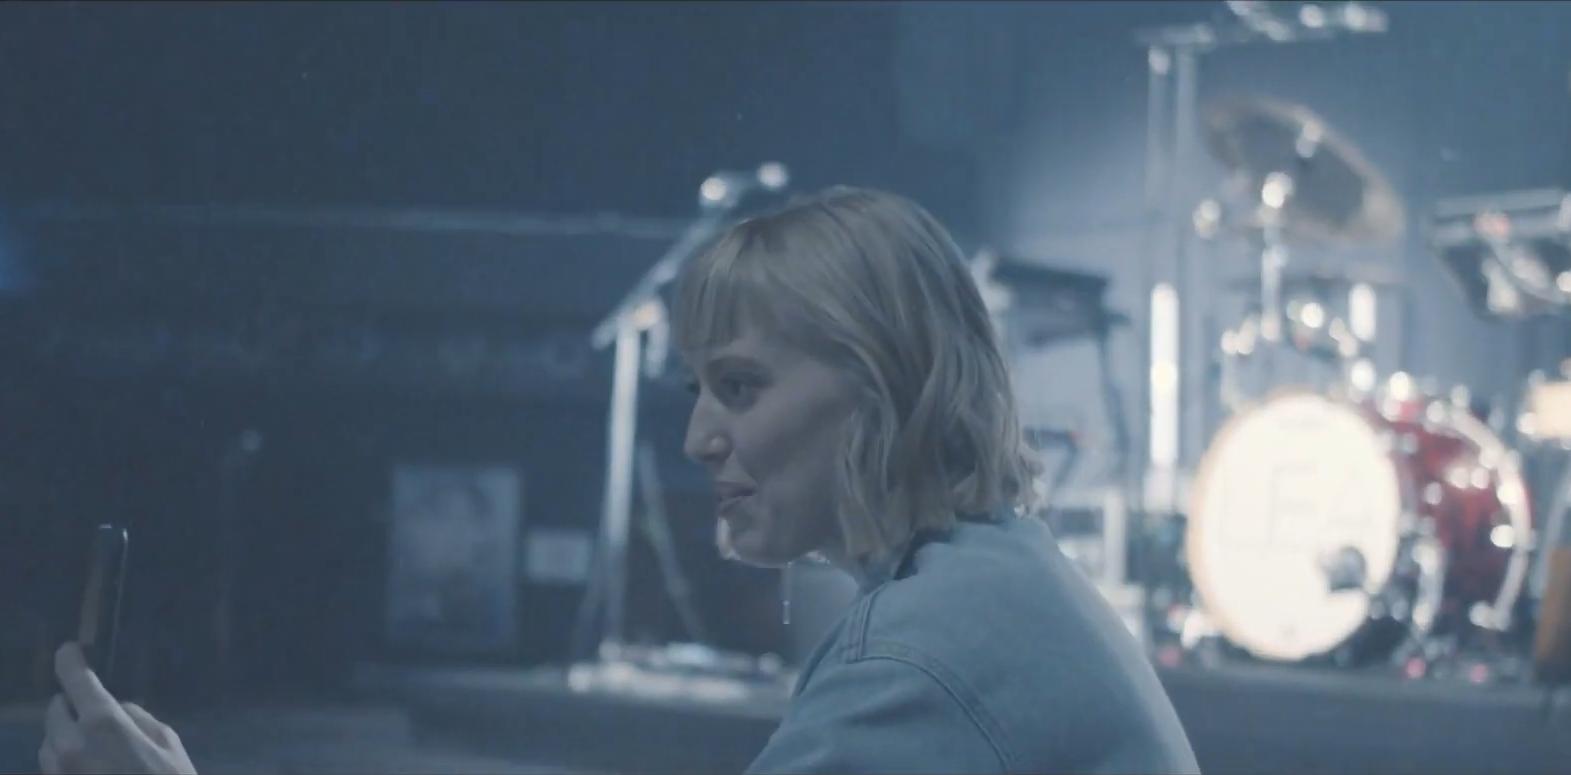 LEA: Behind The Scenes